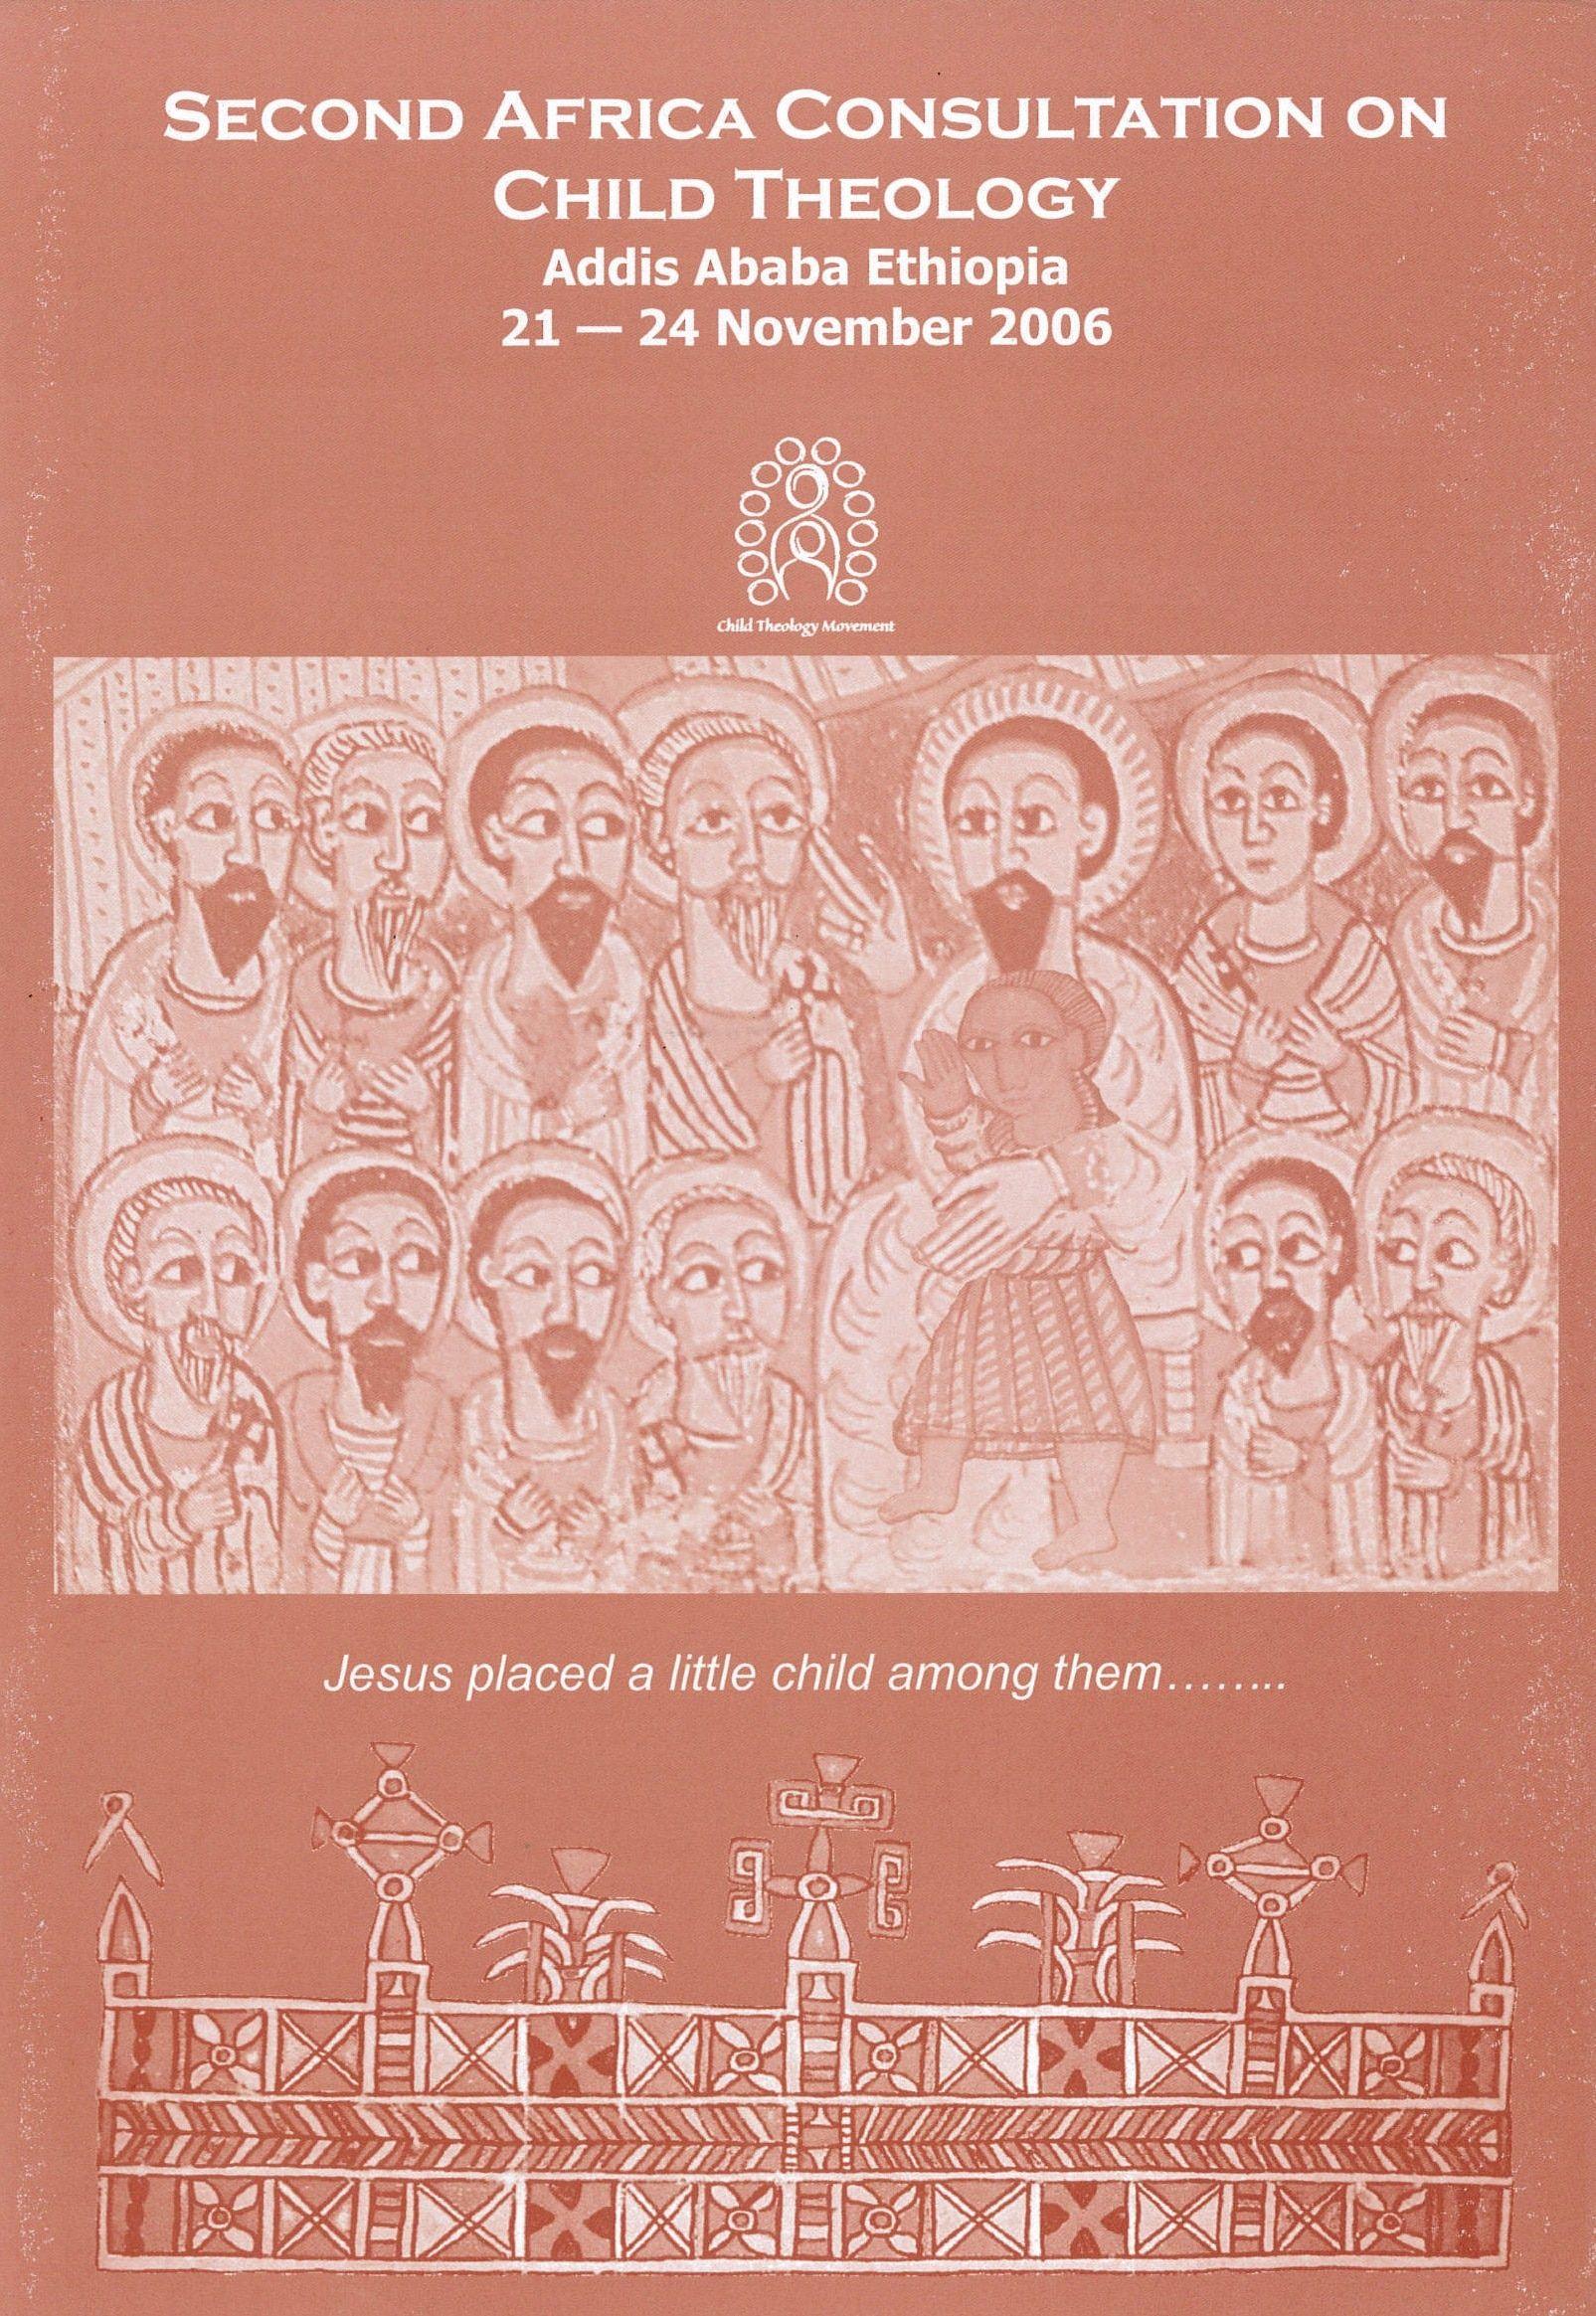 Addis Ababa Ethiopia 21st-24th November 2006 Cover